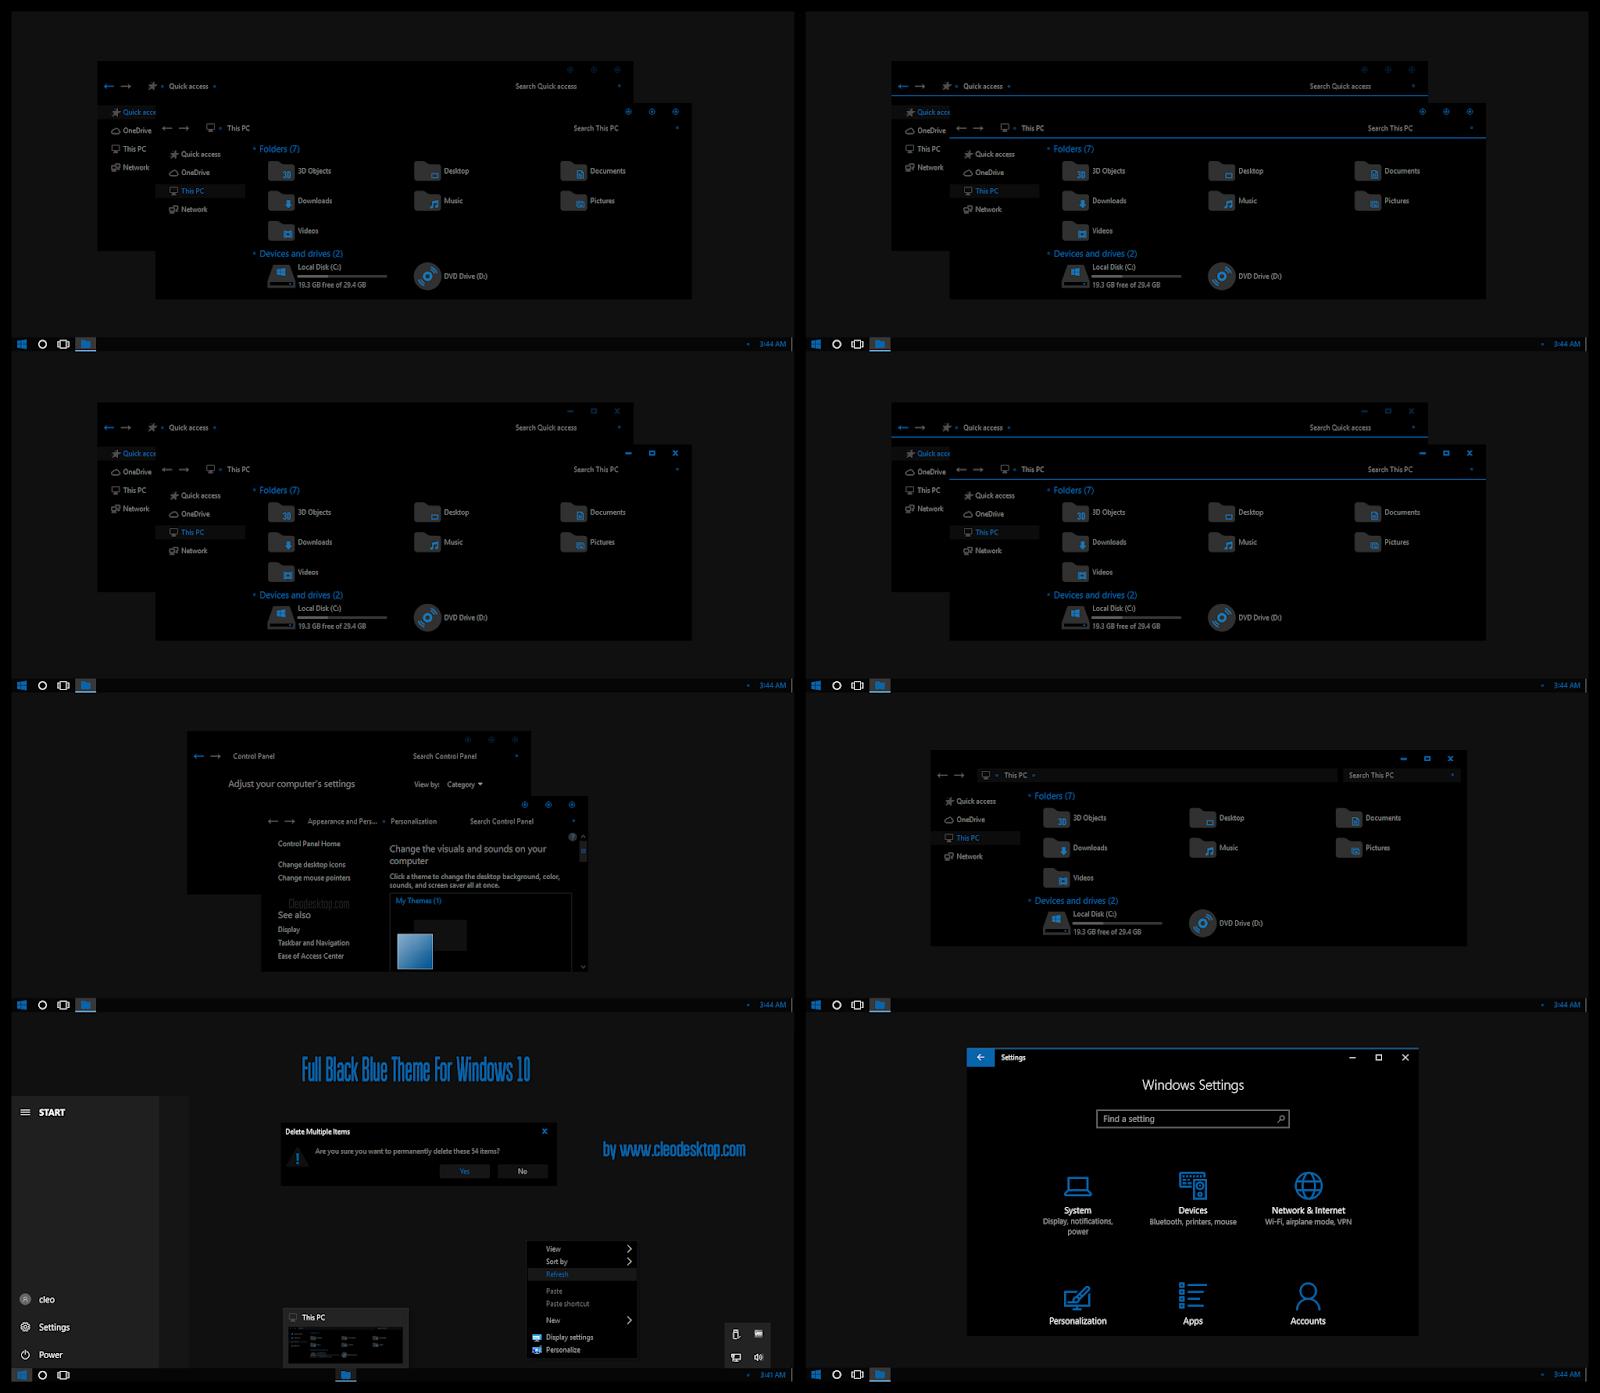 Full Black Blue Theme Windows10 May 2019 Update 1903